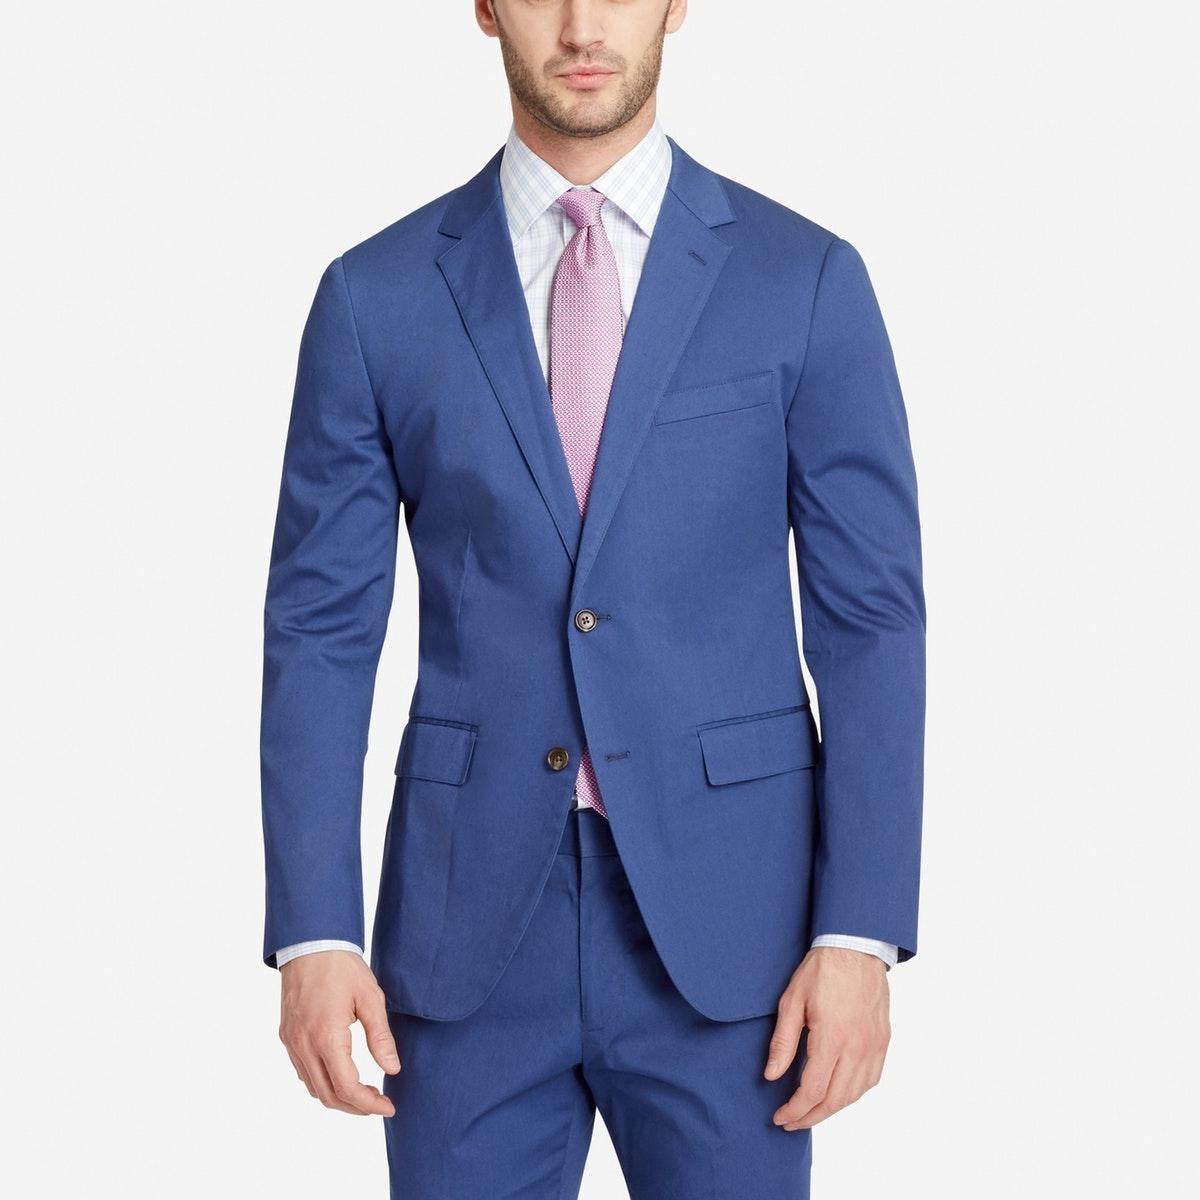 Jetsetter Stretch Italian Cotton Suit Jacket